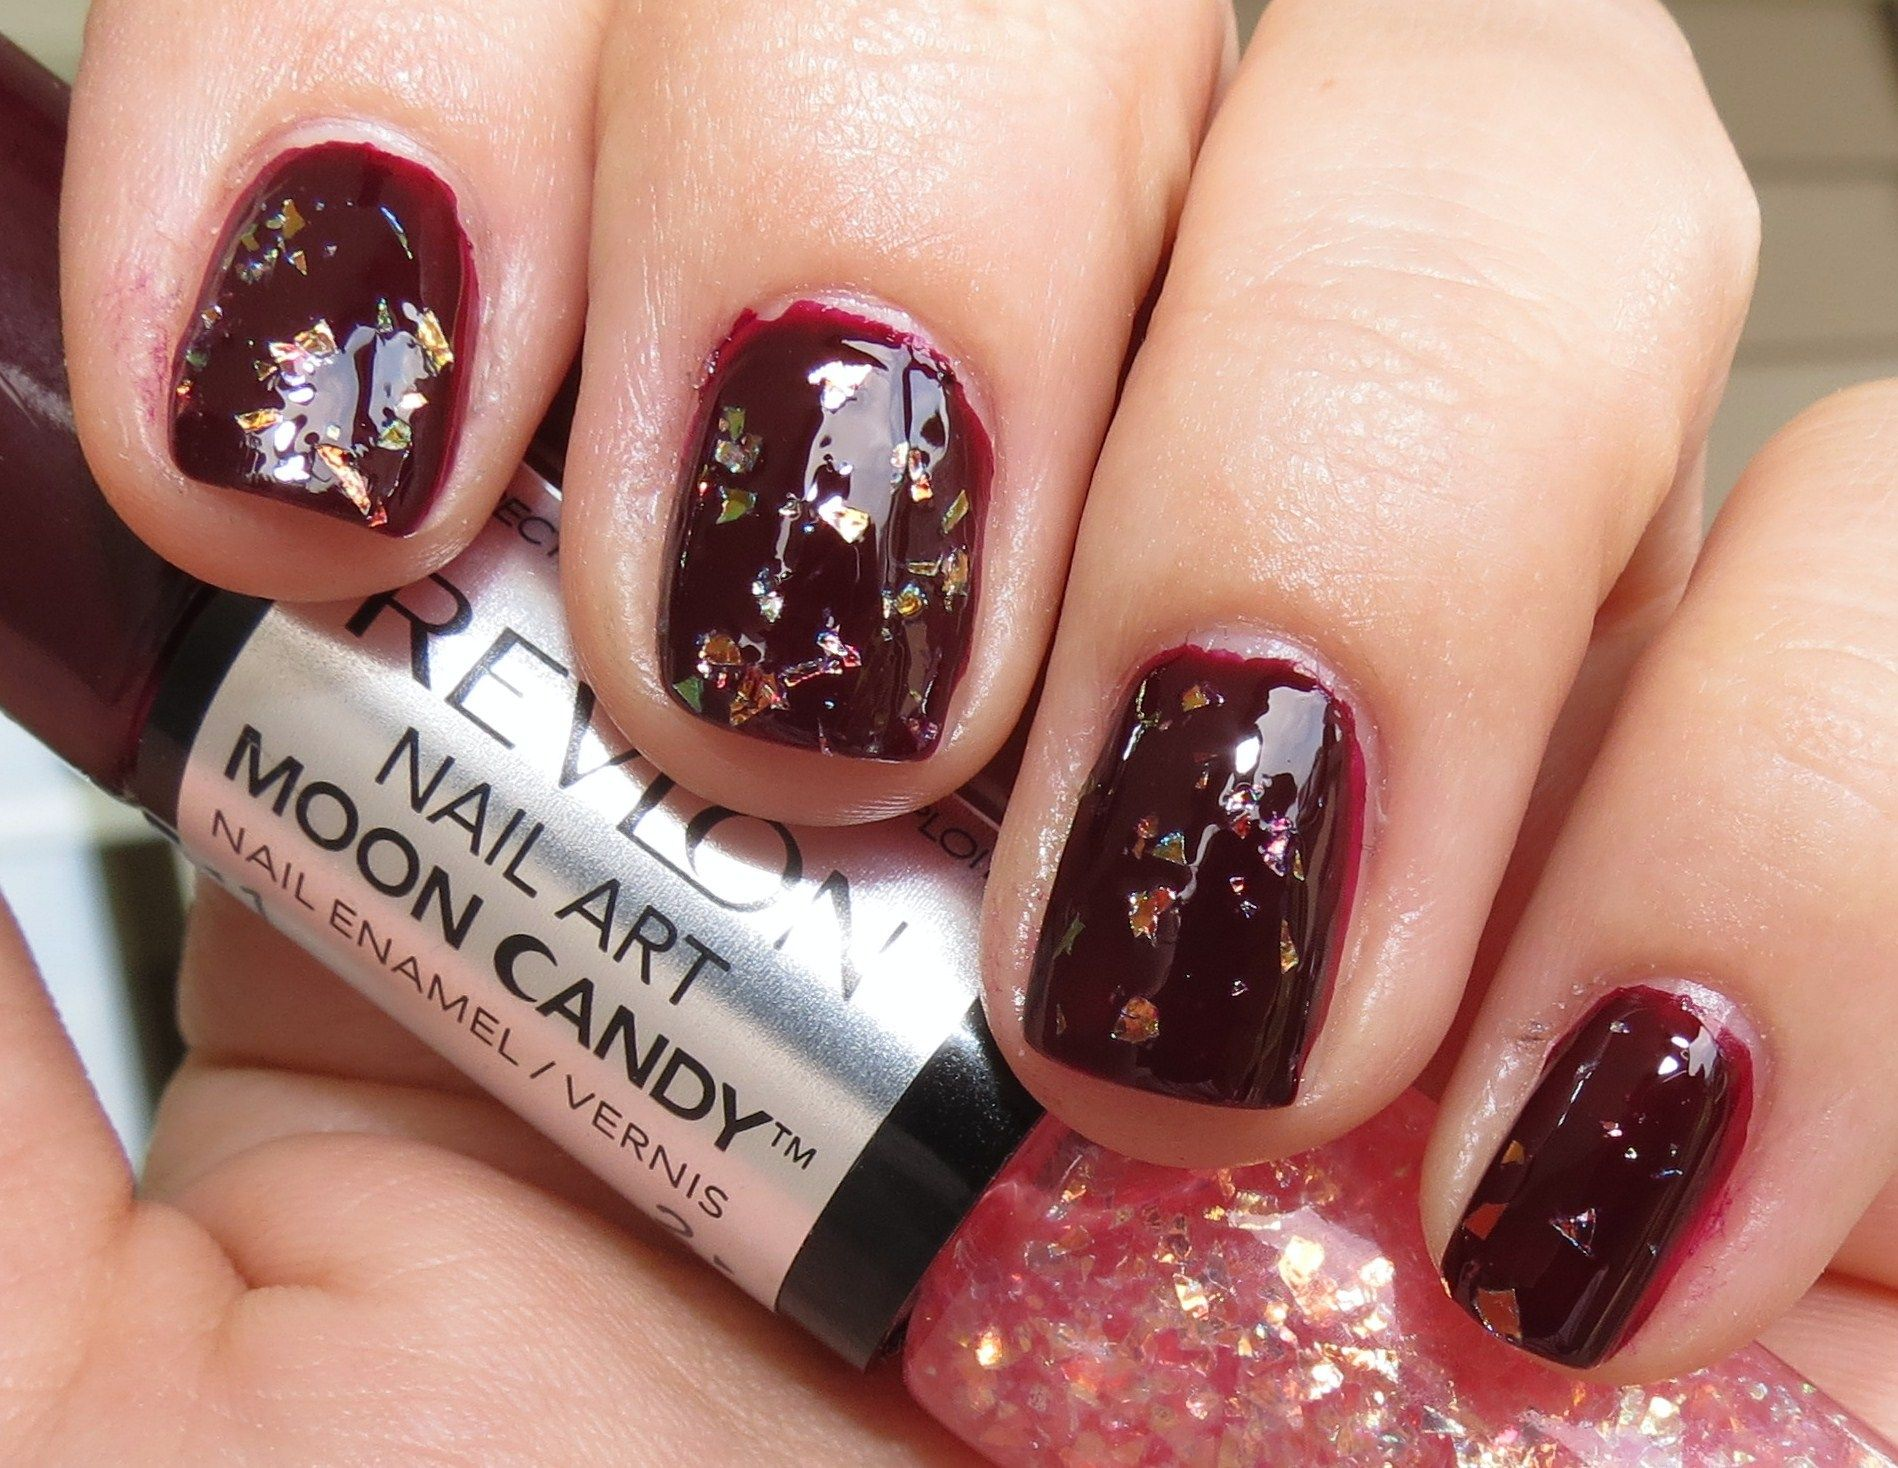 Revlon Satellite Nail Art Moon Candy Nail Enamel Swatches Review